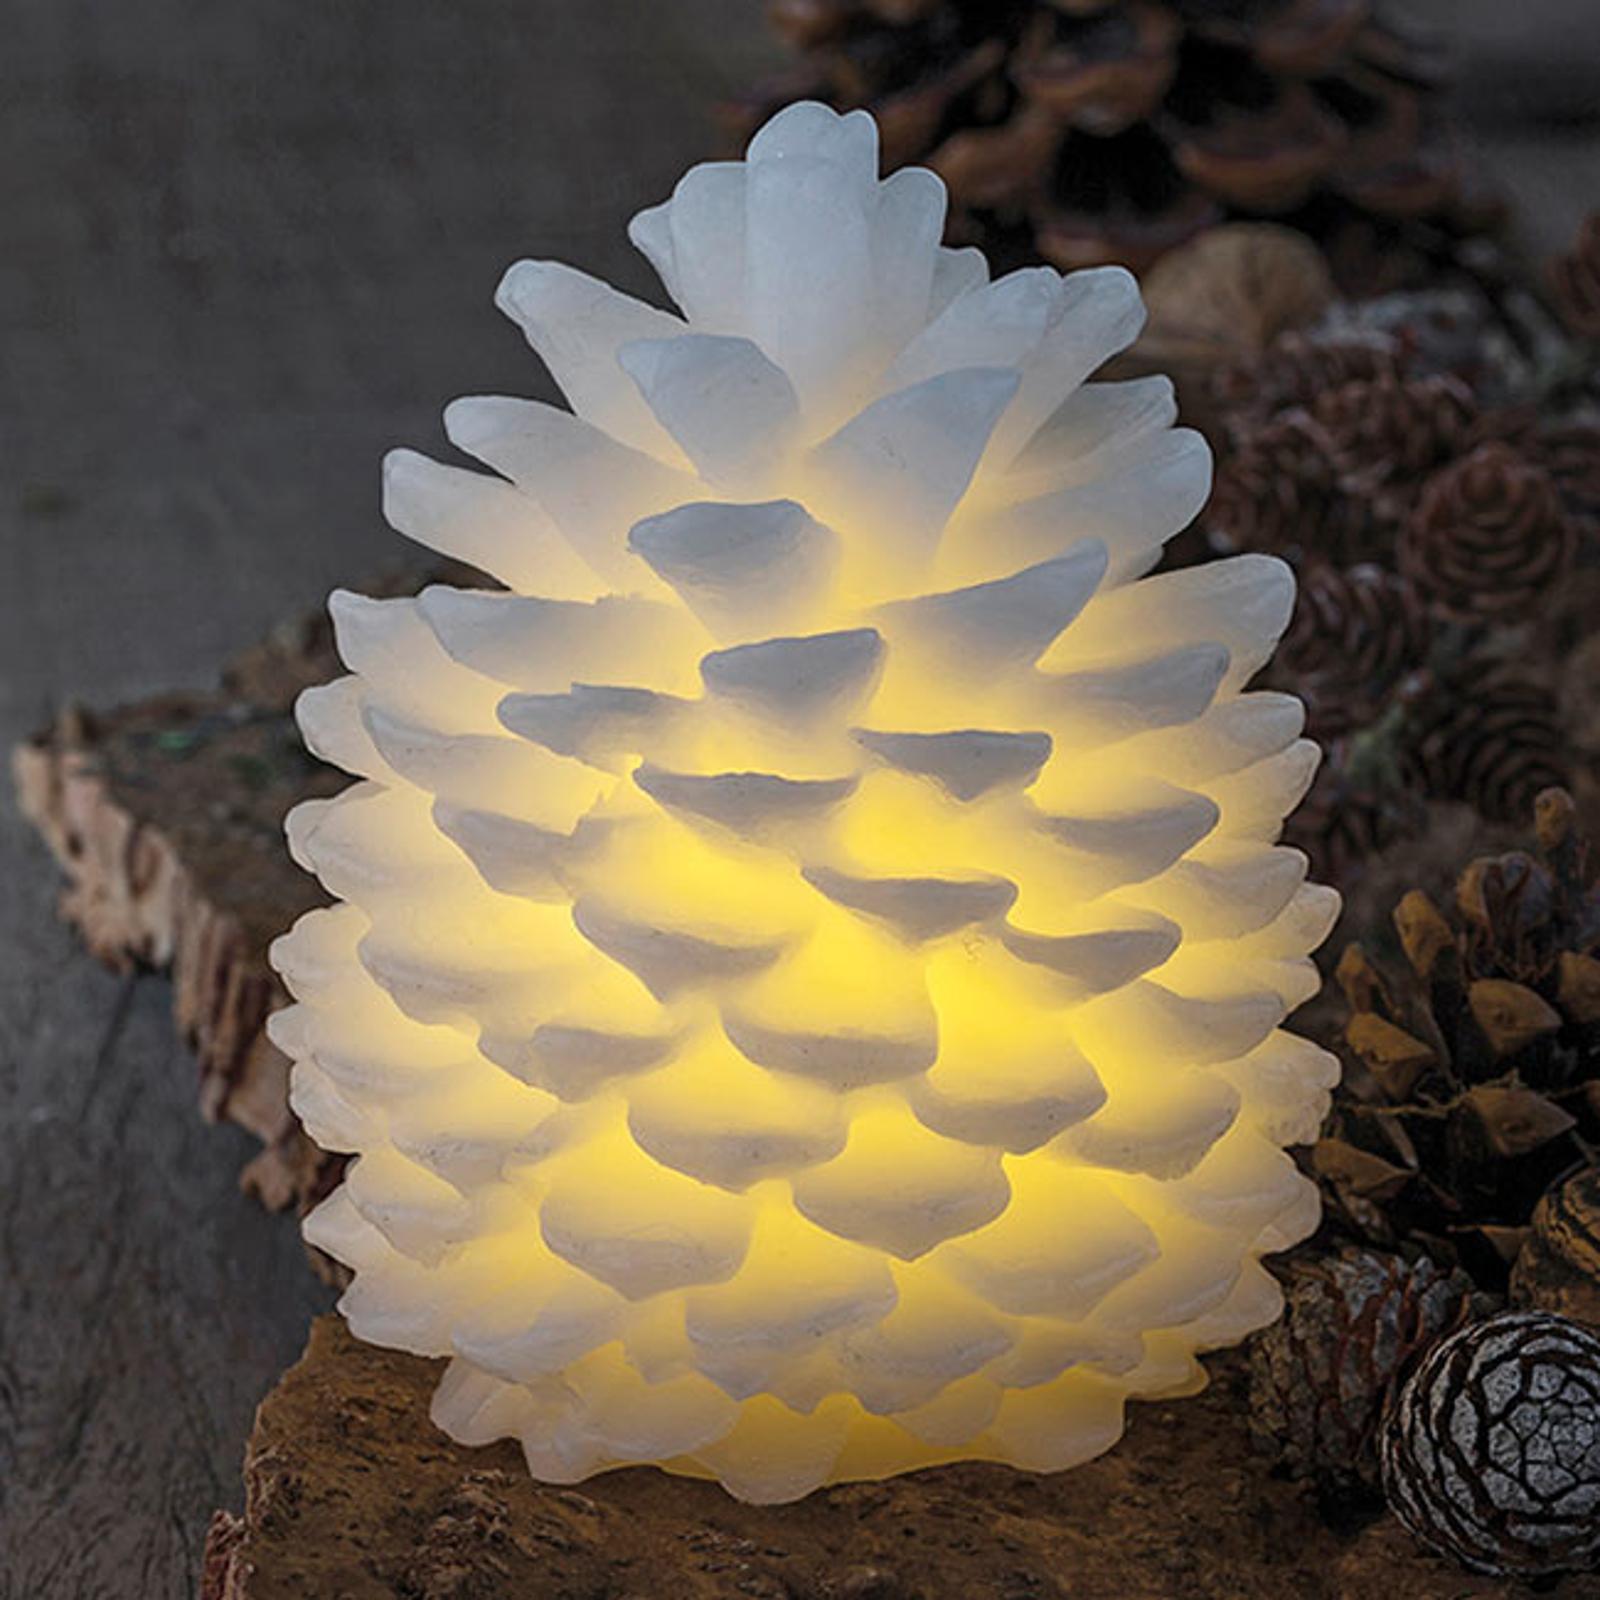 LED-Kerze Clara in Zapfenform, Höhe 14 cm